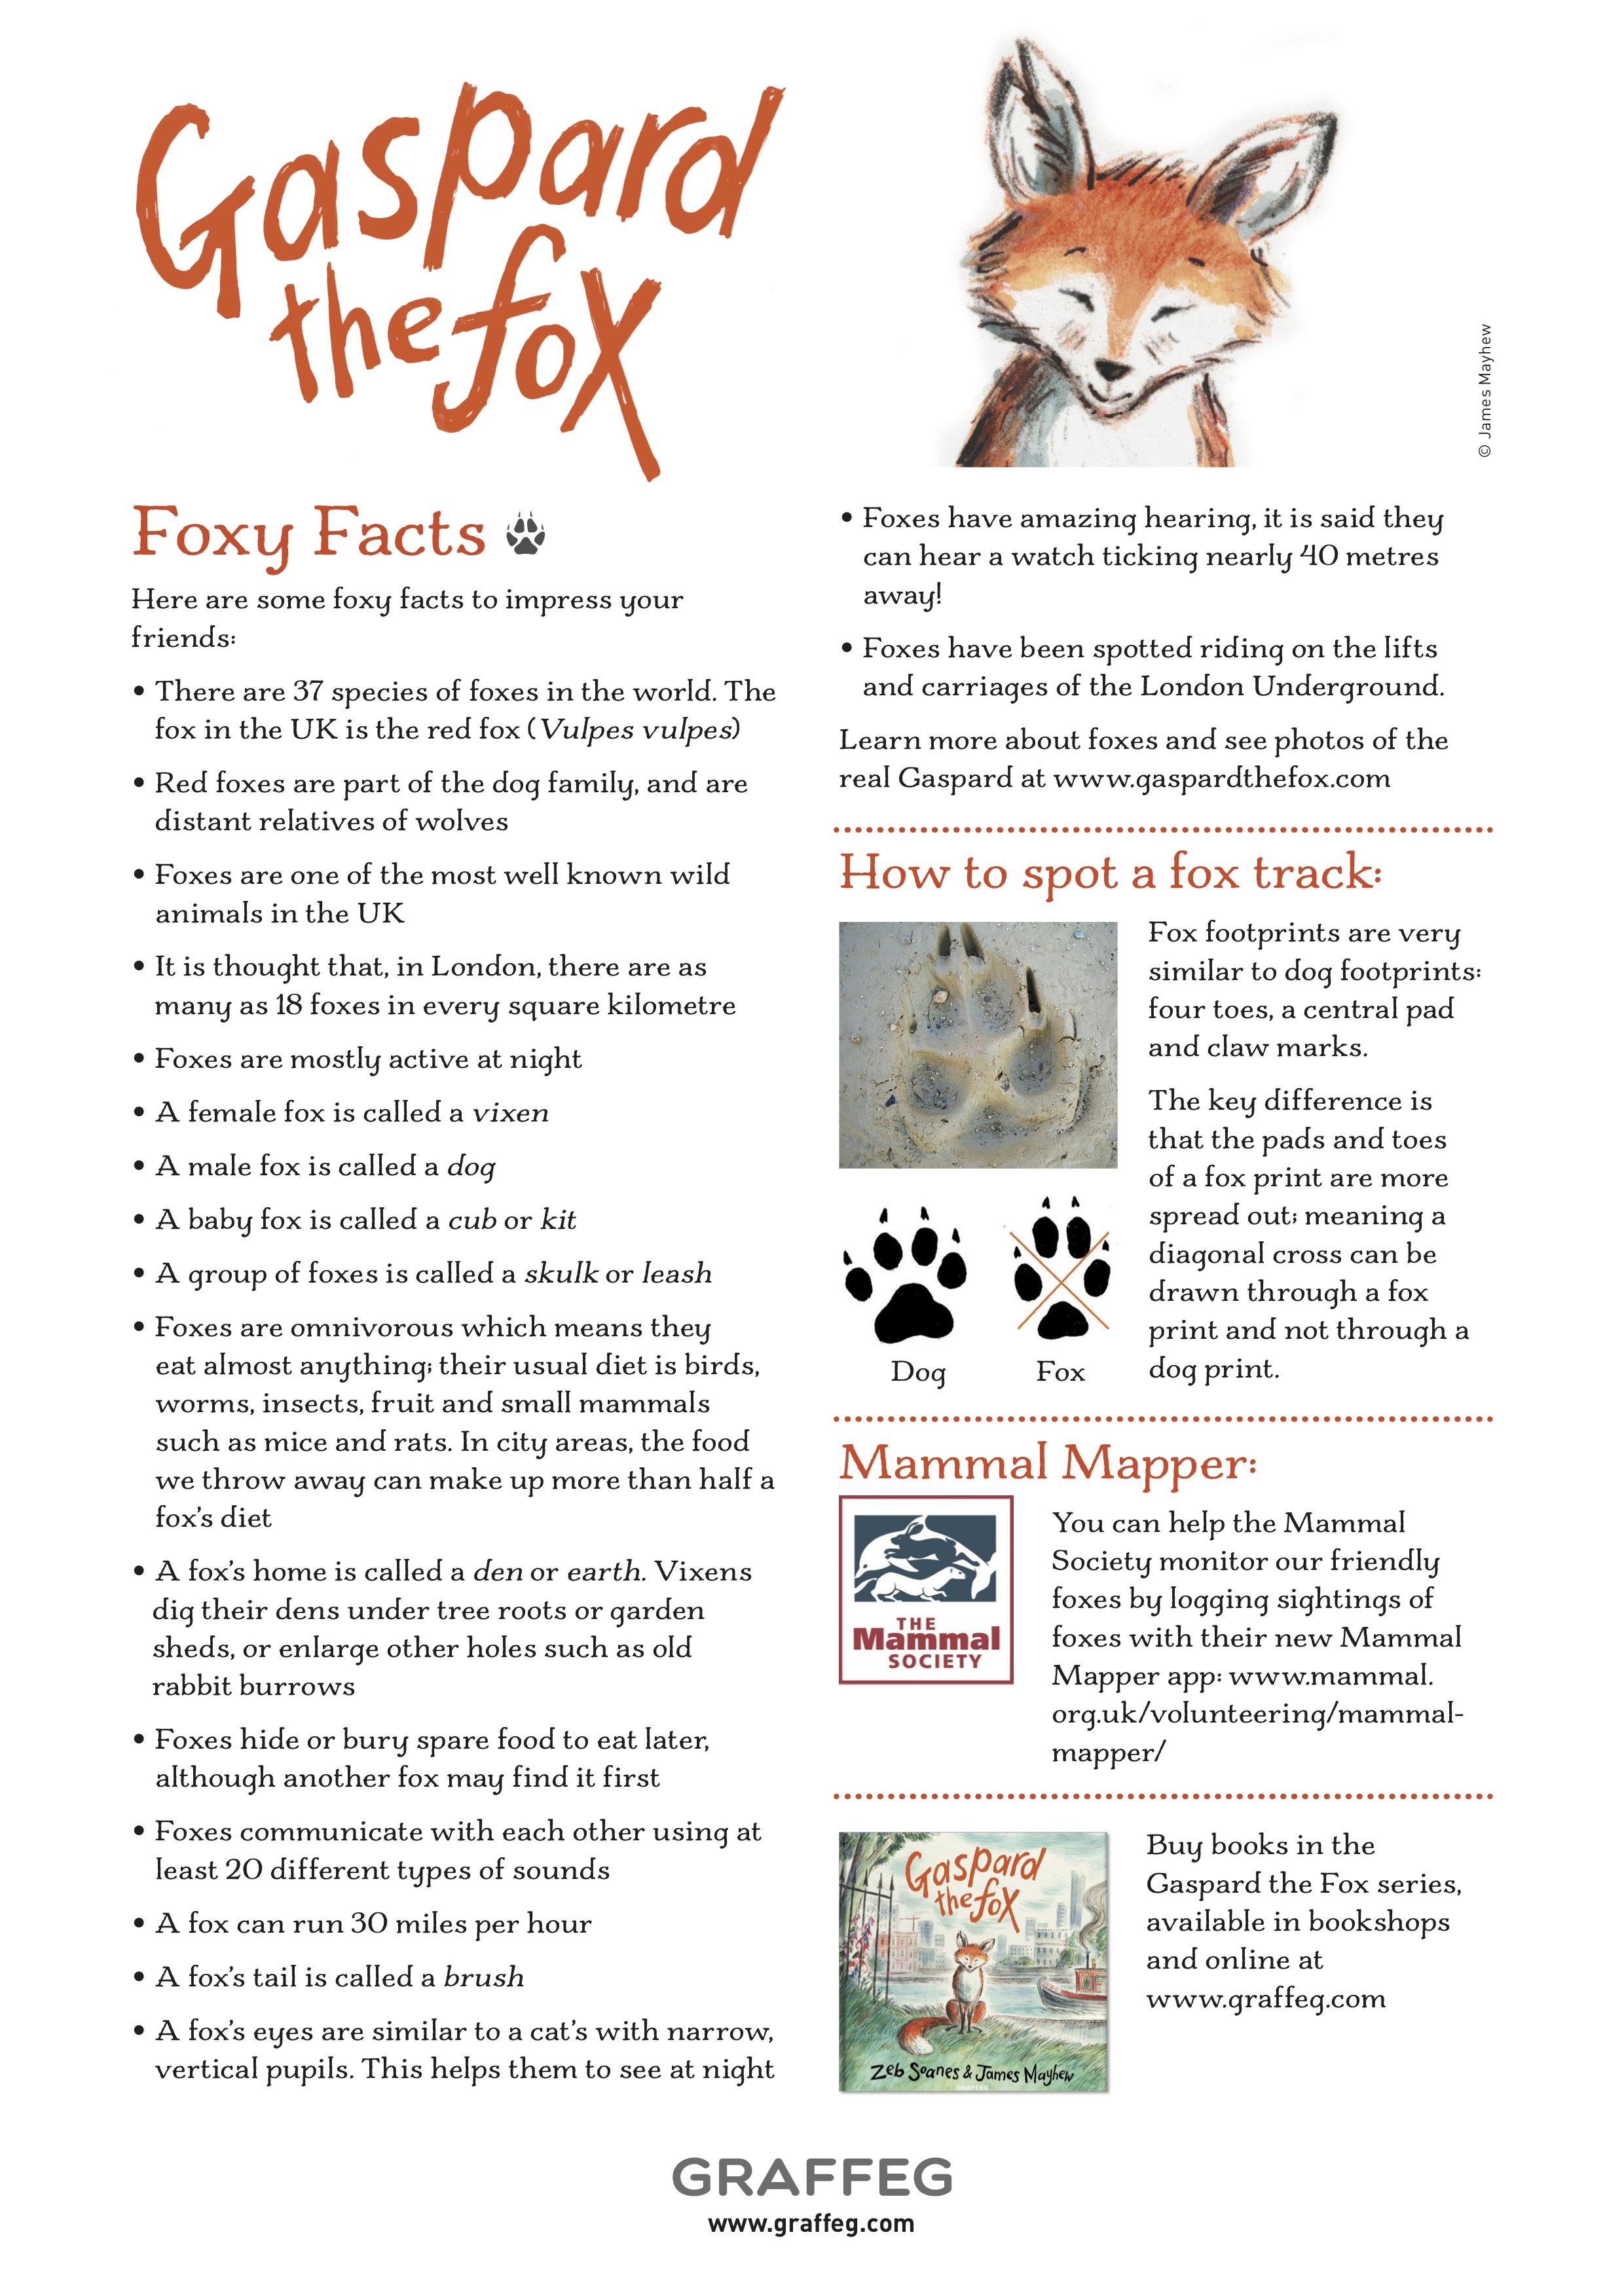 Gaspard Fox Facts (jpg).jpg